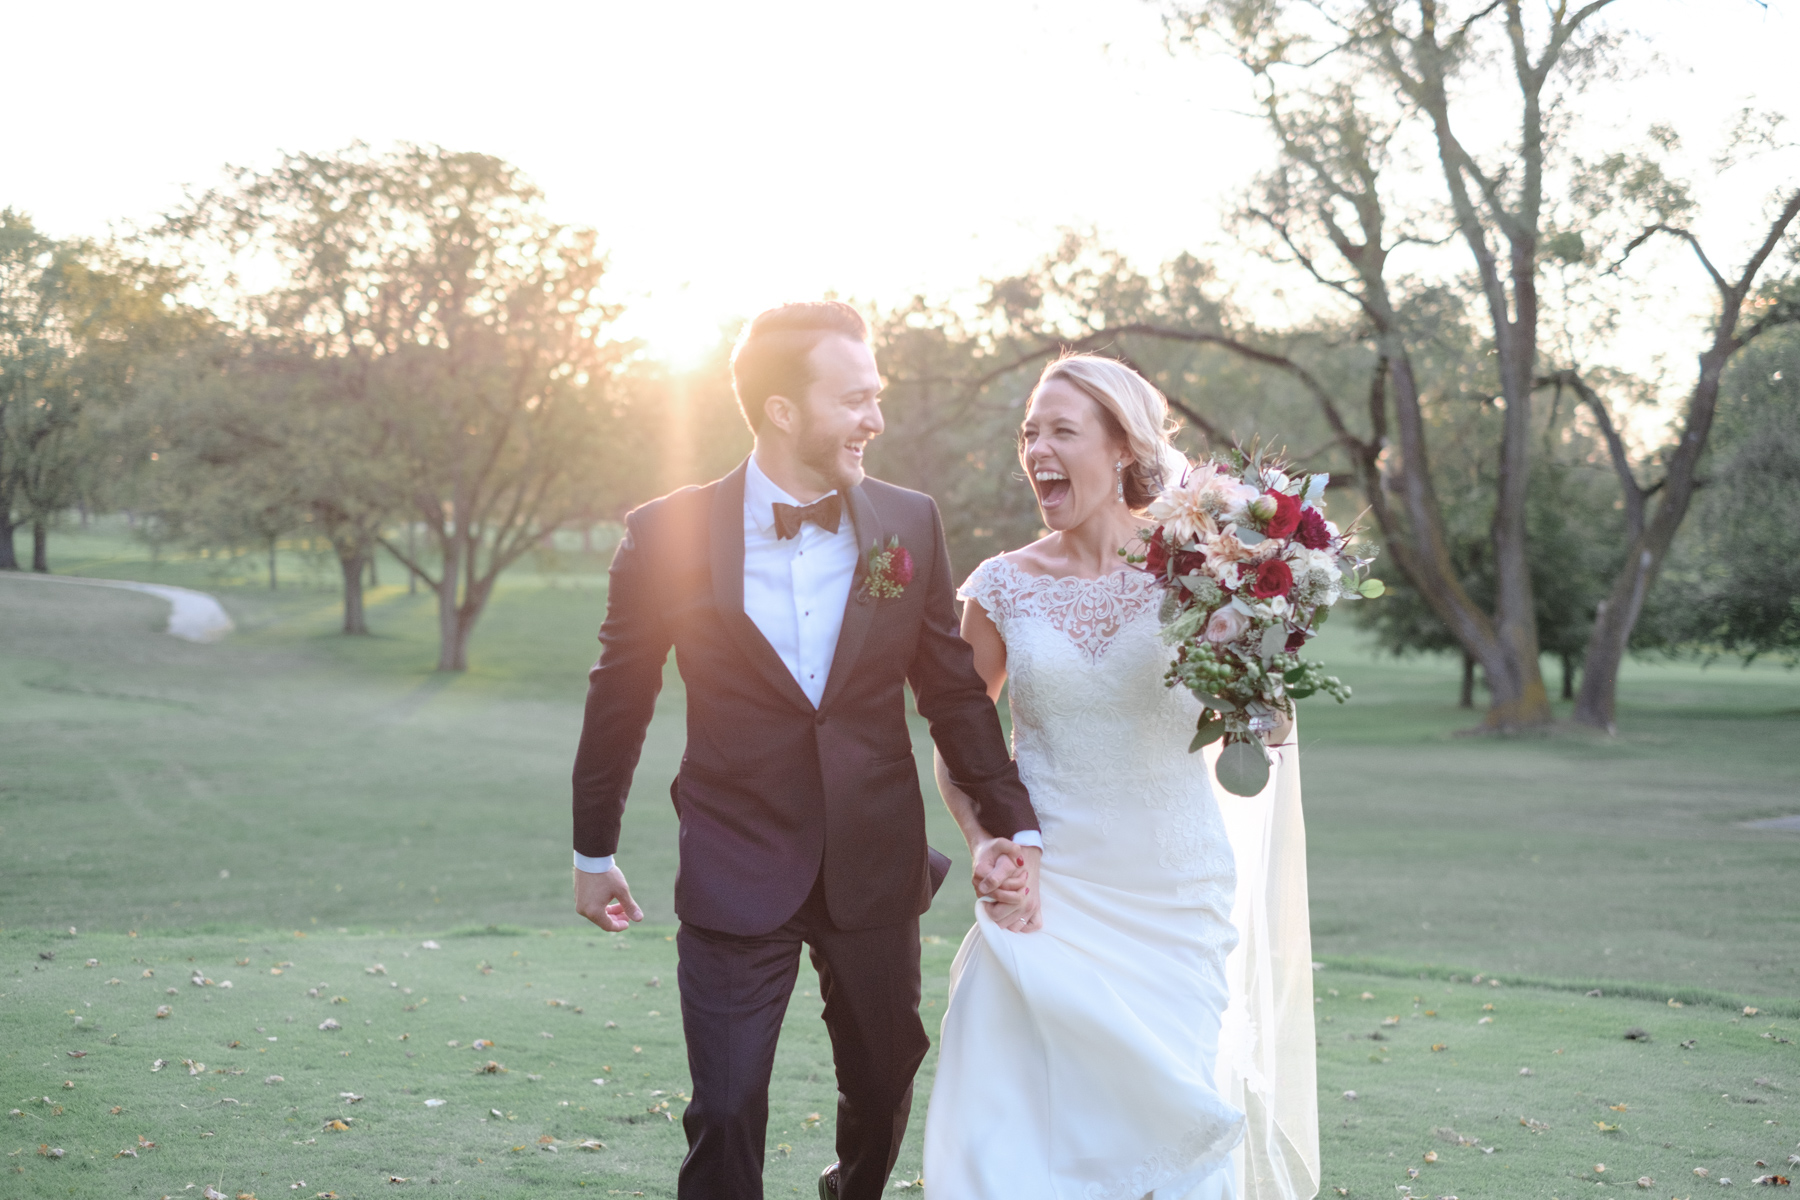 2017_BAP_KalliMatt_Gleneagles_CountryClub_Lemont_Wedding-58.jpg